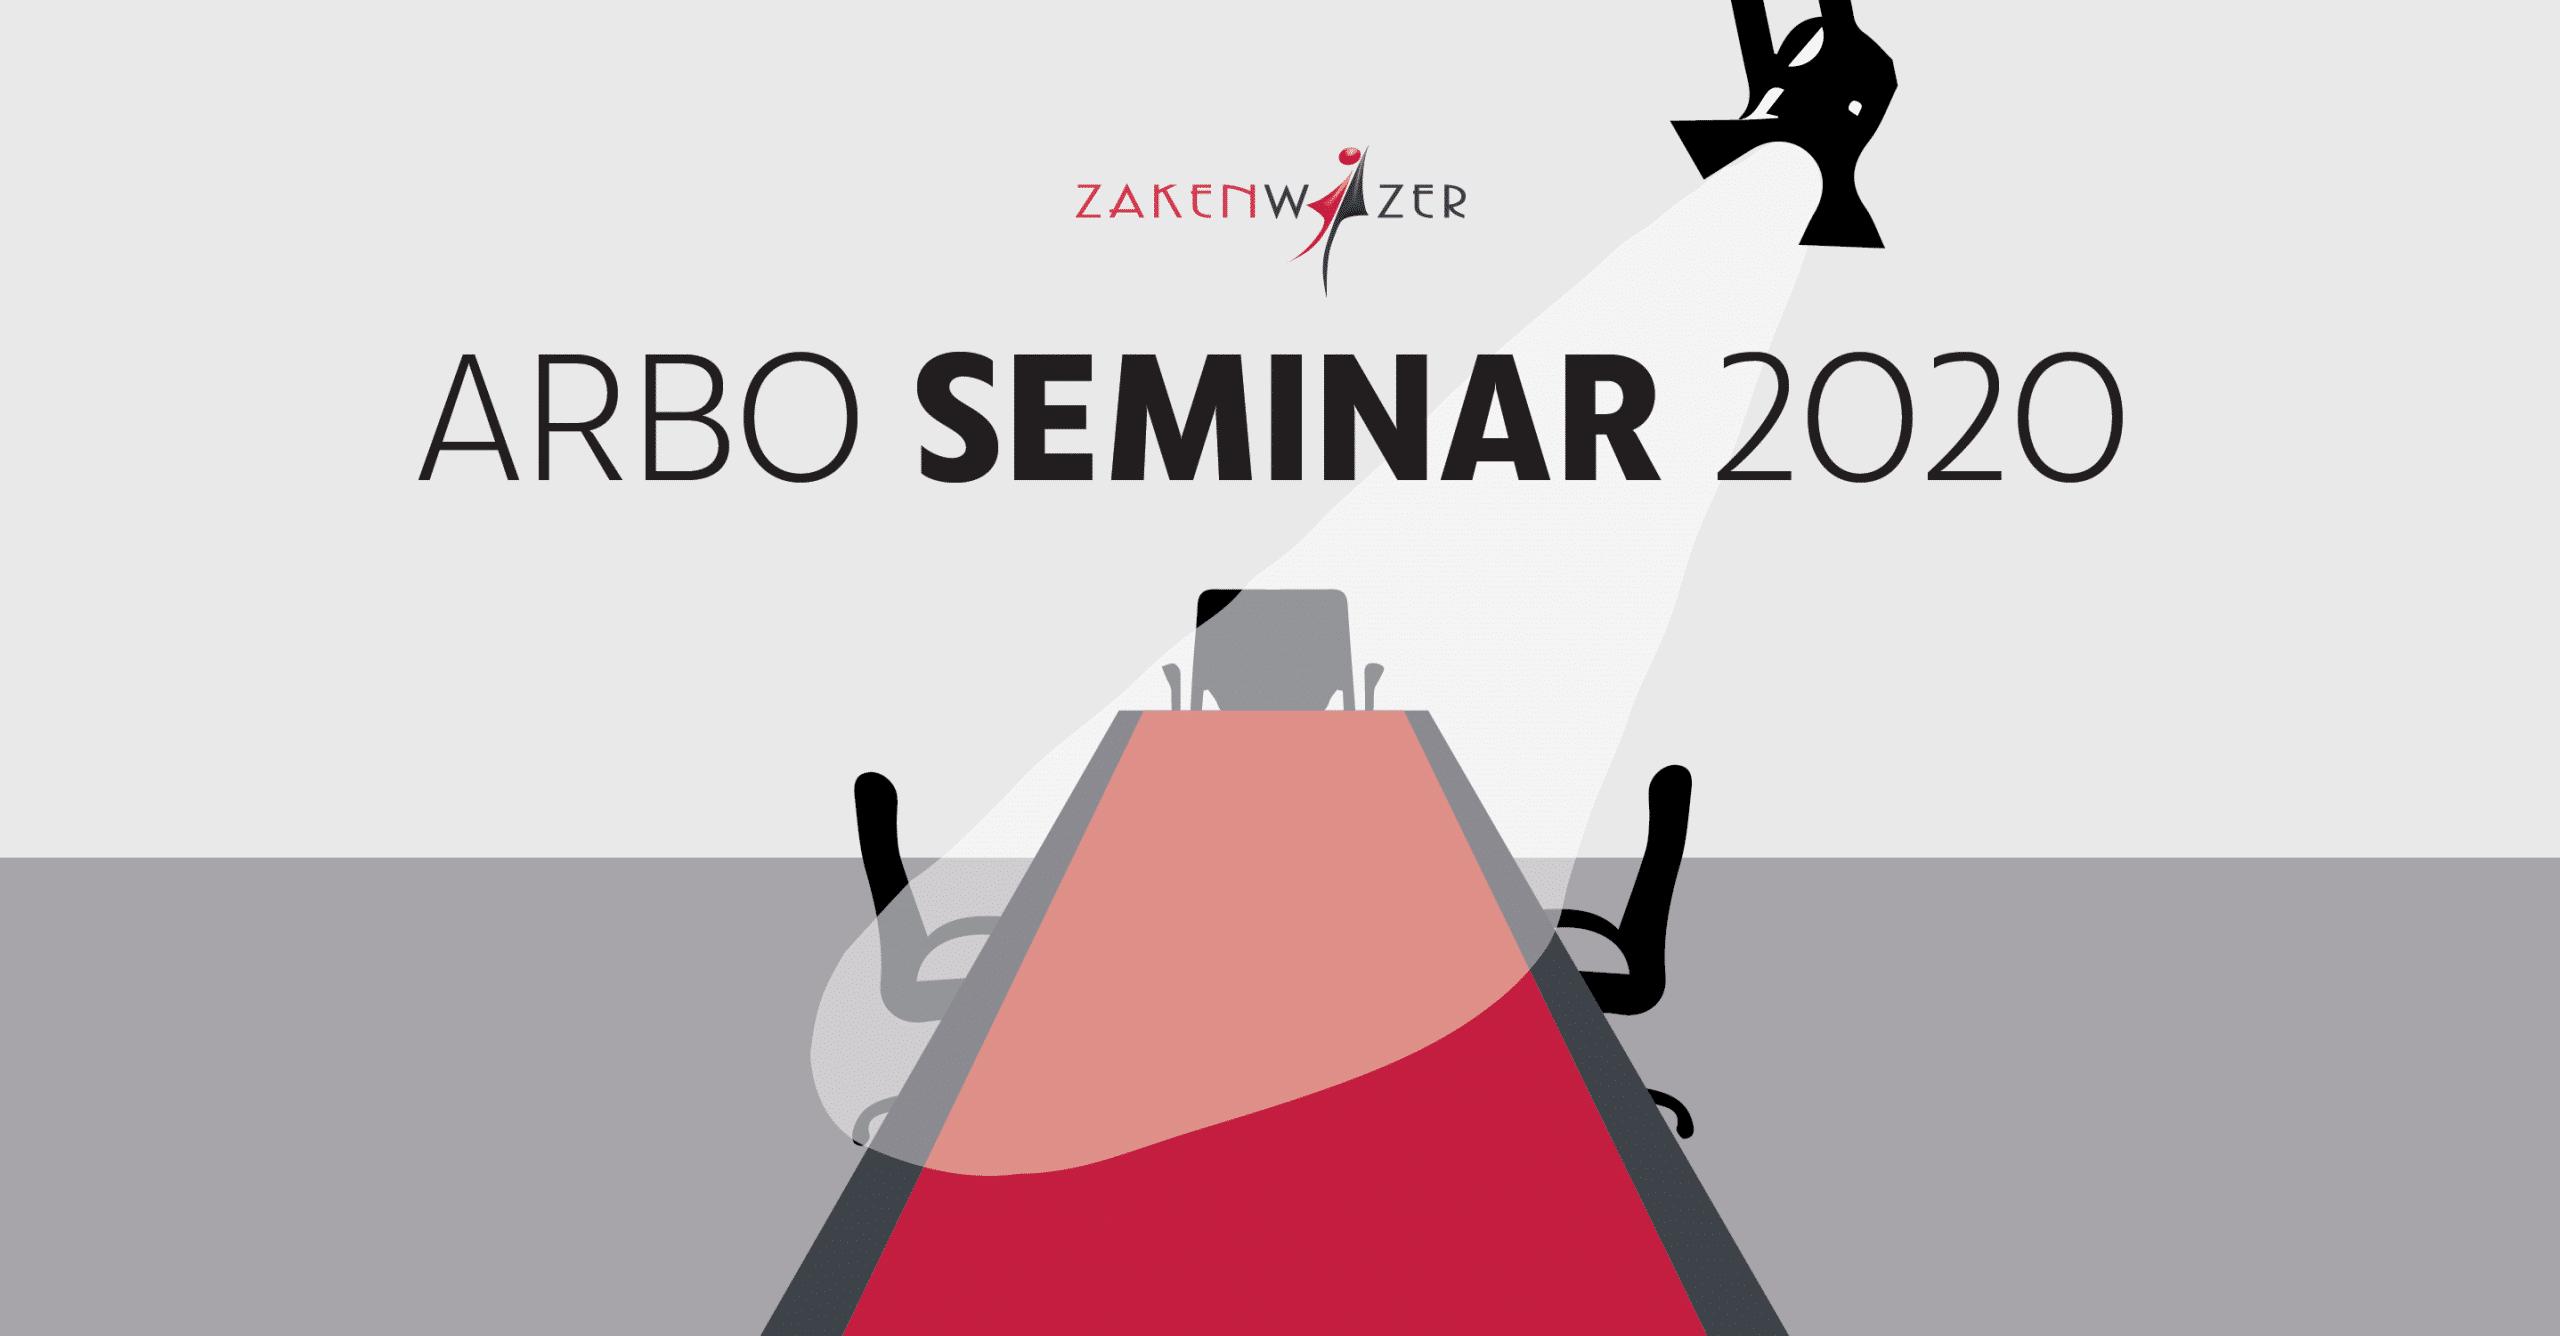 arbo seminar 2020